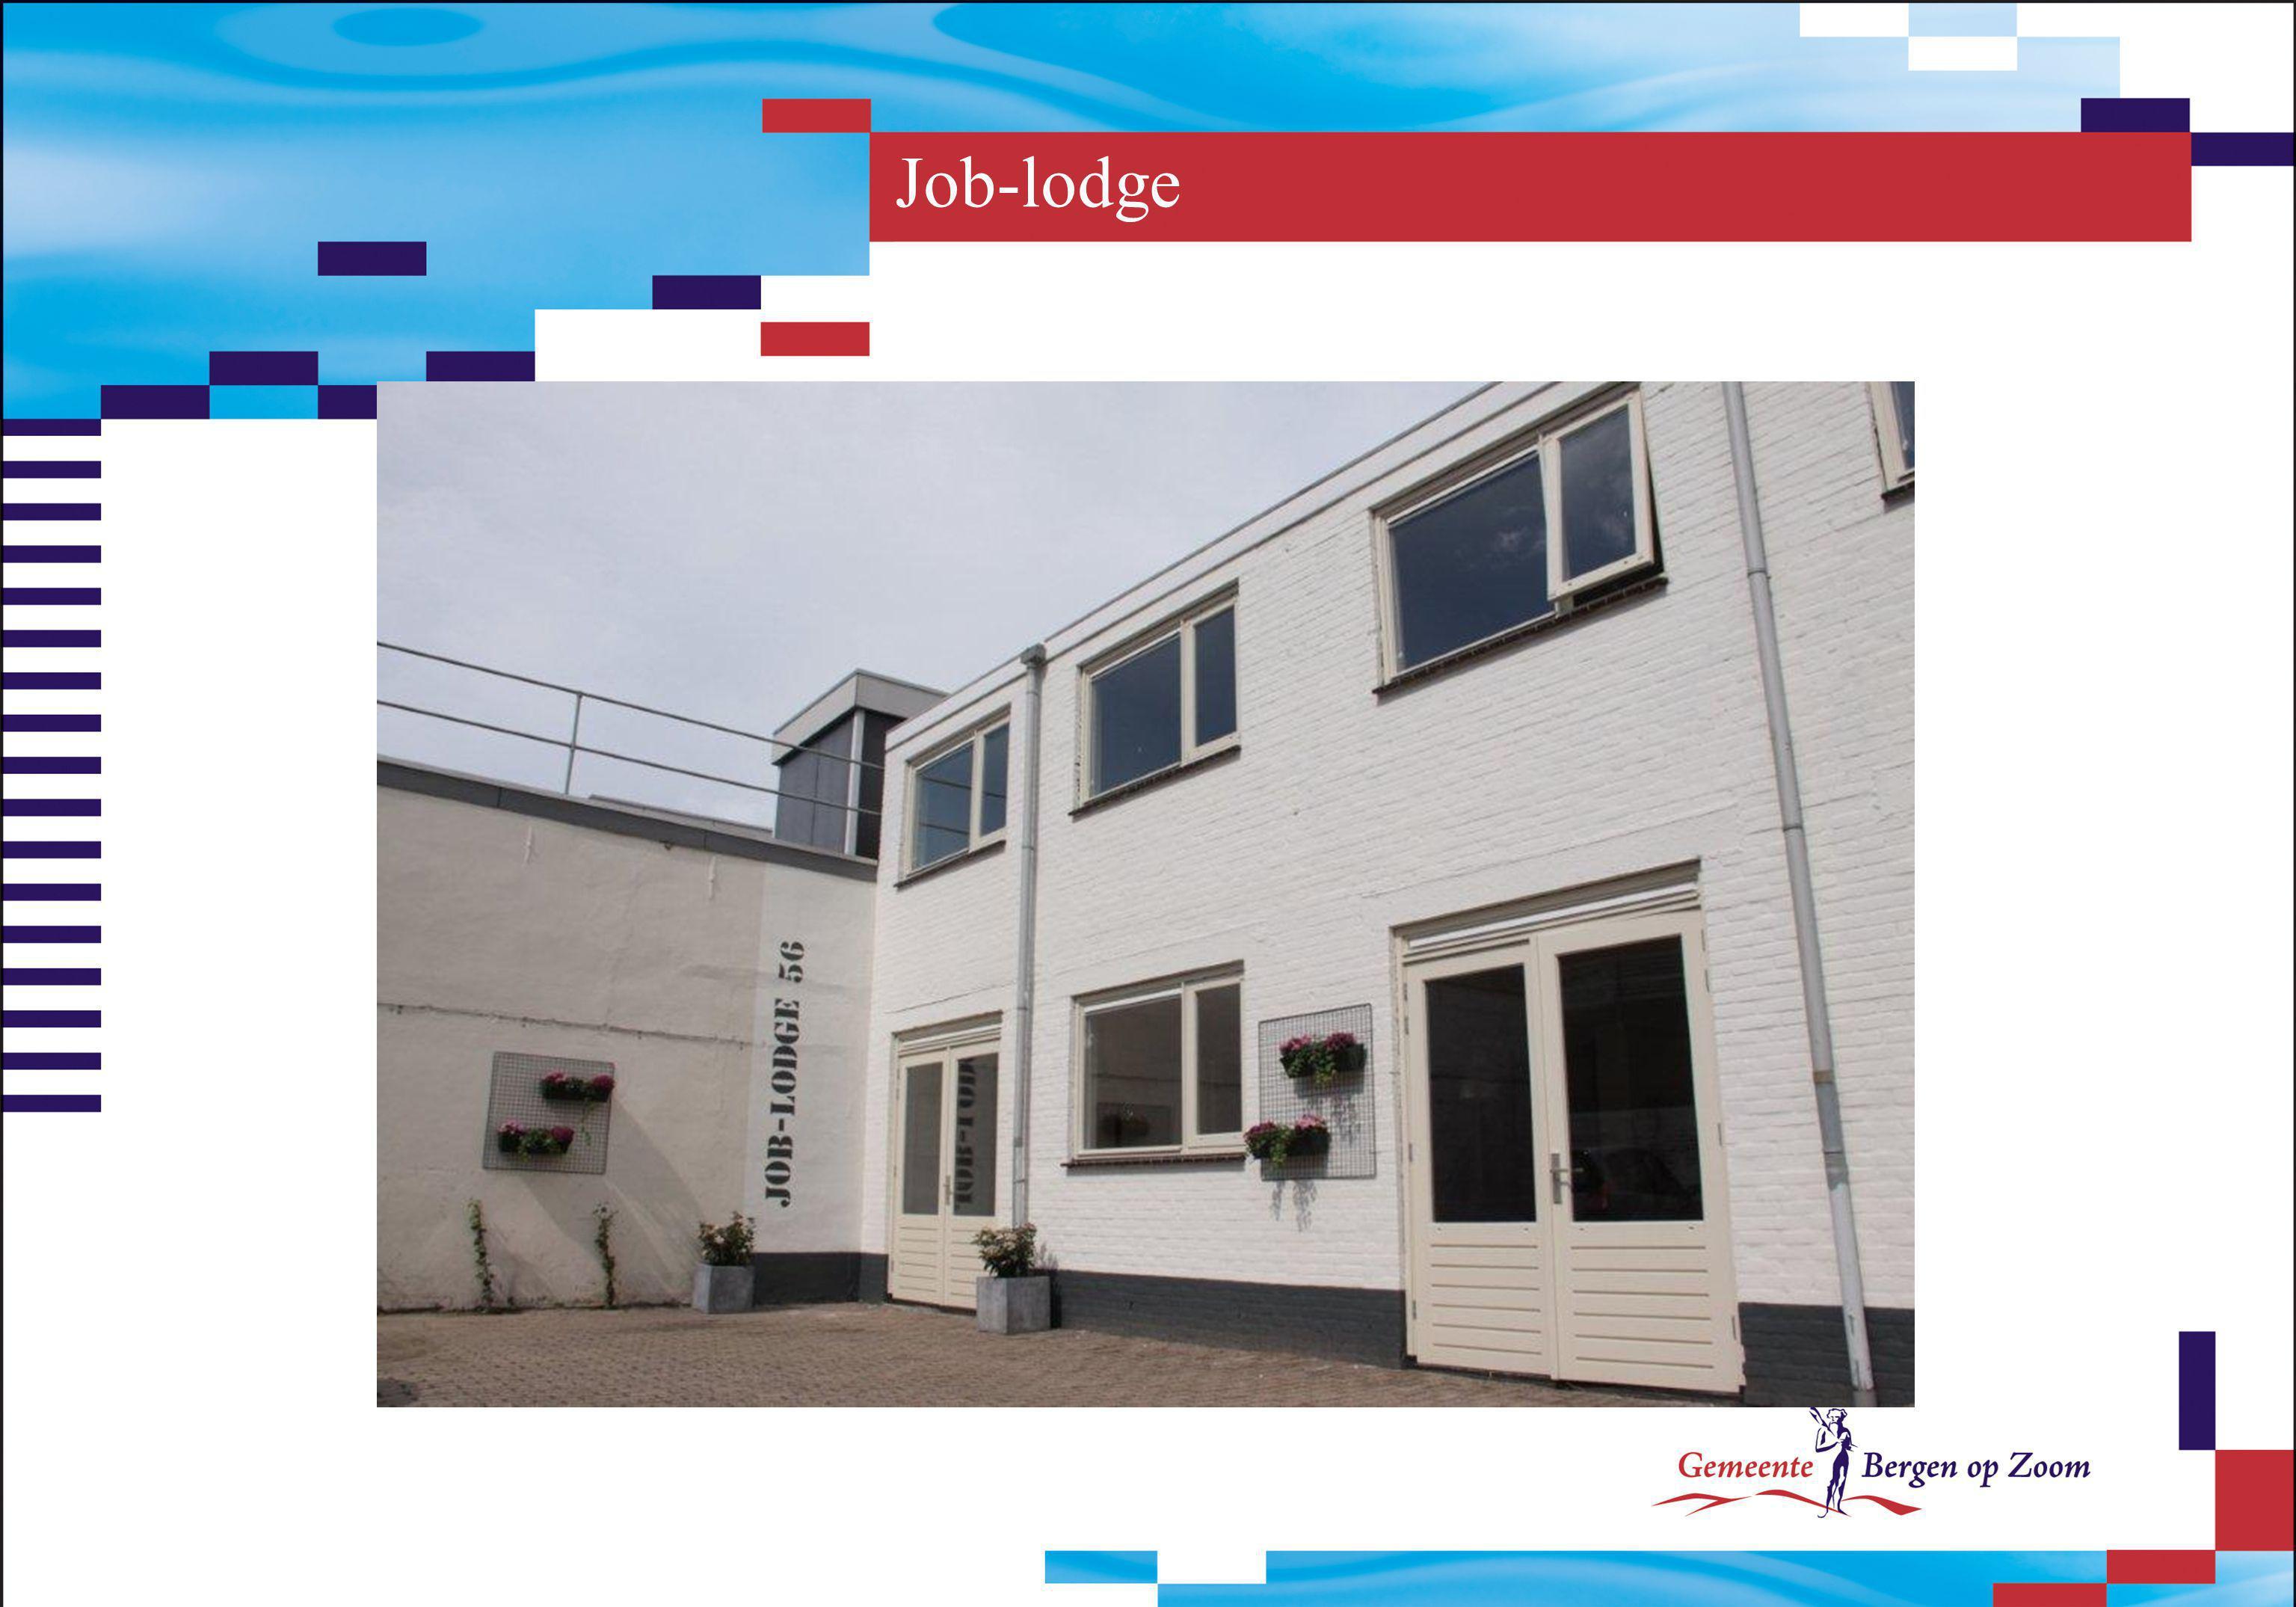 Job-lodge